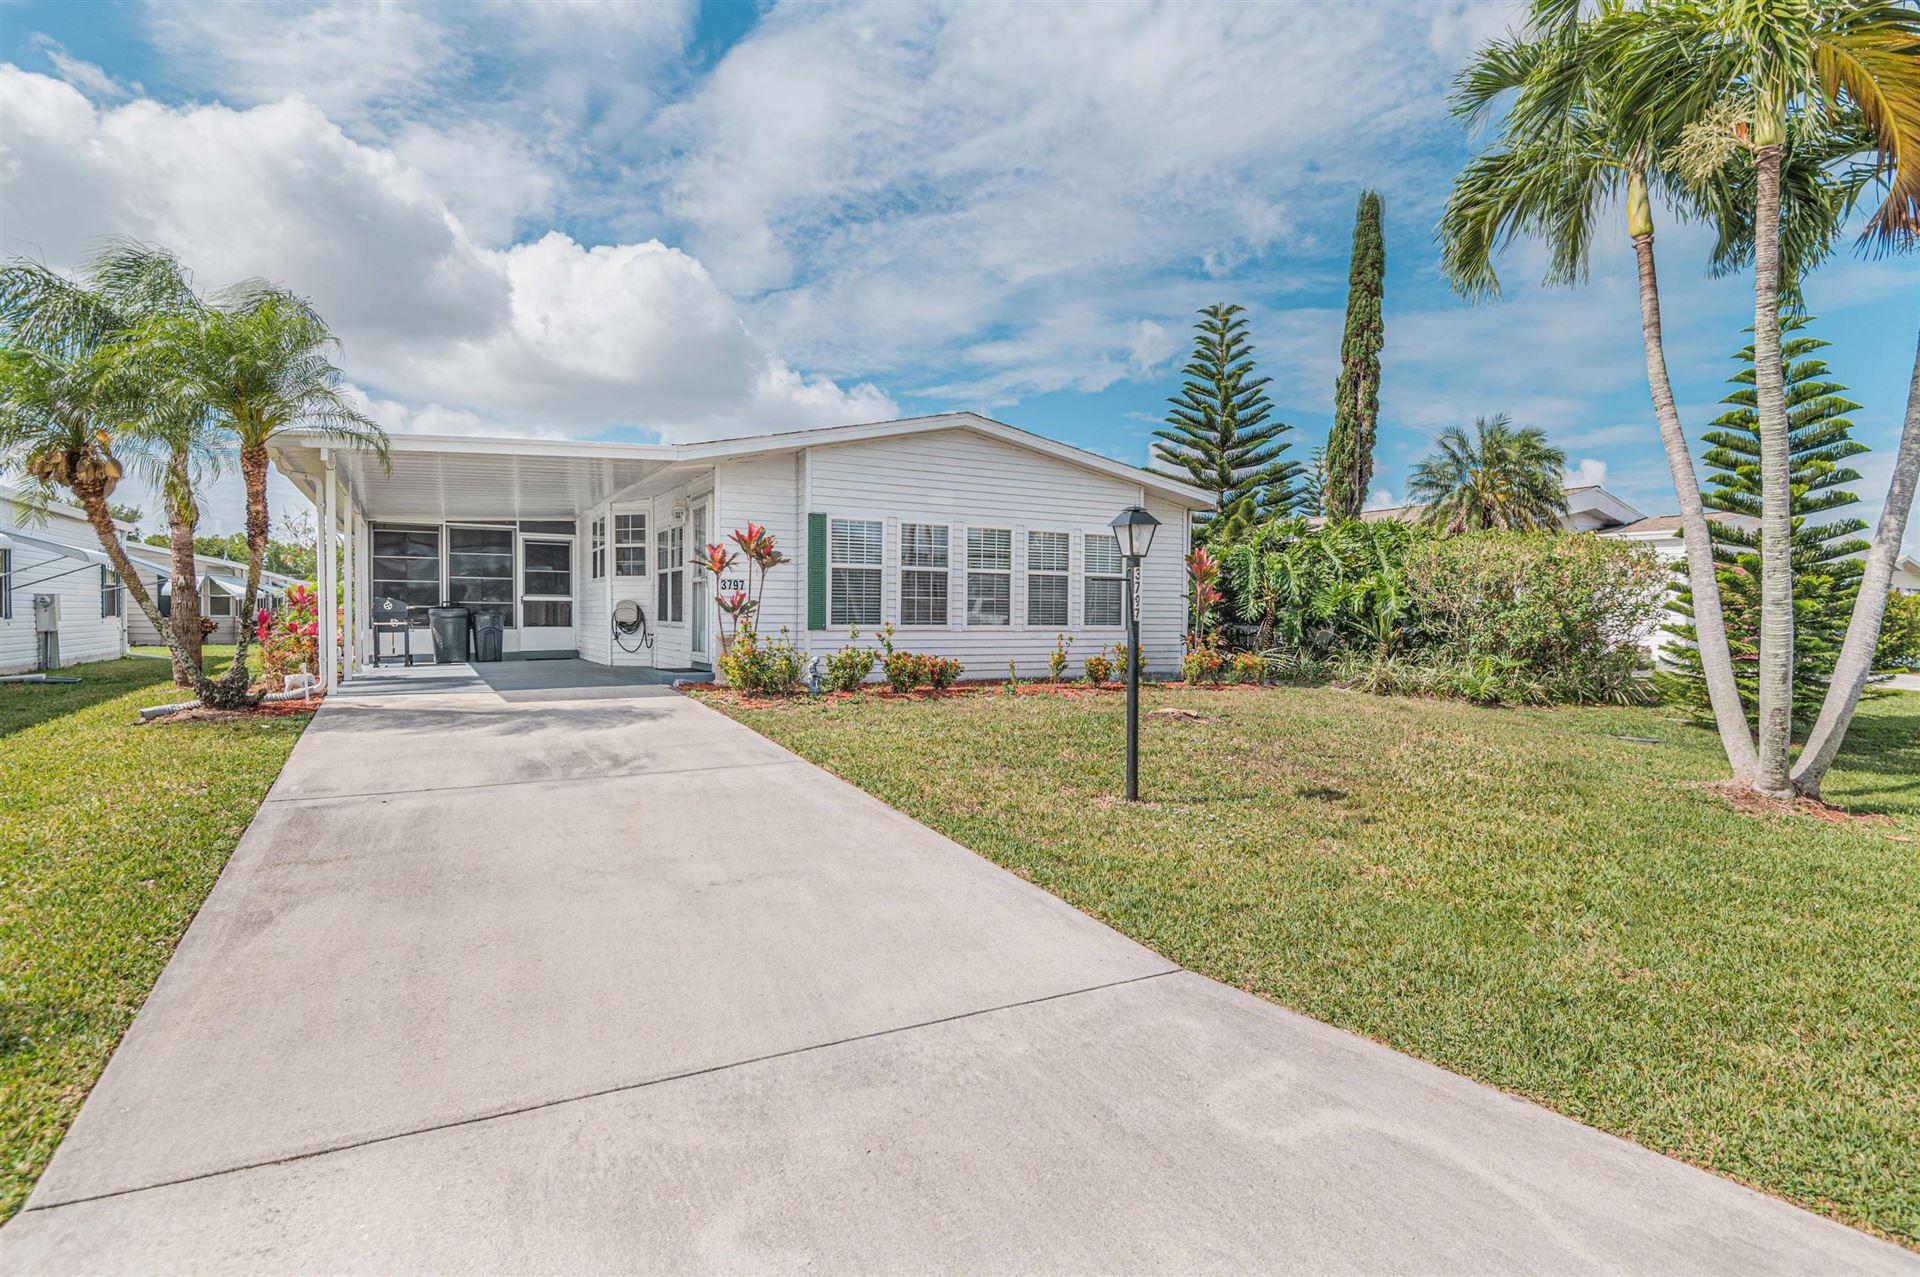 3797 Sapodilla Court, Port Saint Lucie, FL 34952 - MLS#: RX-10712680